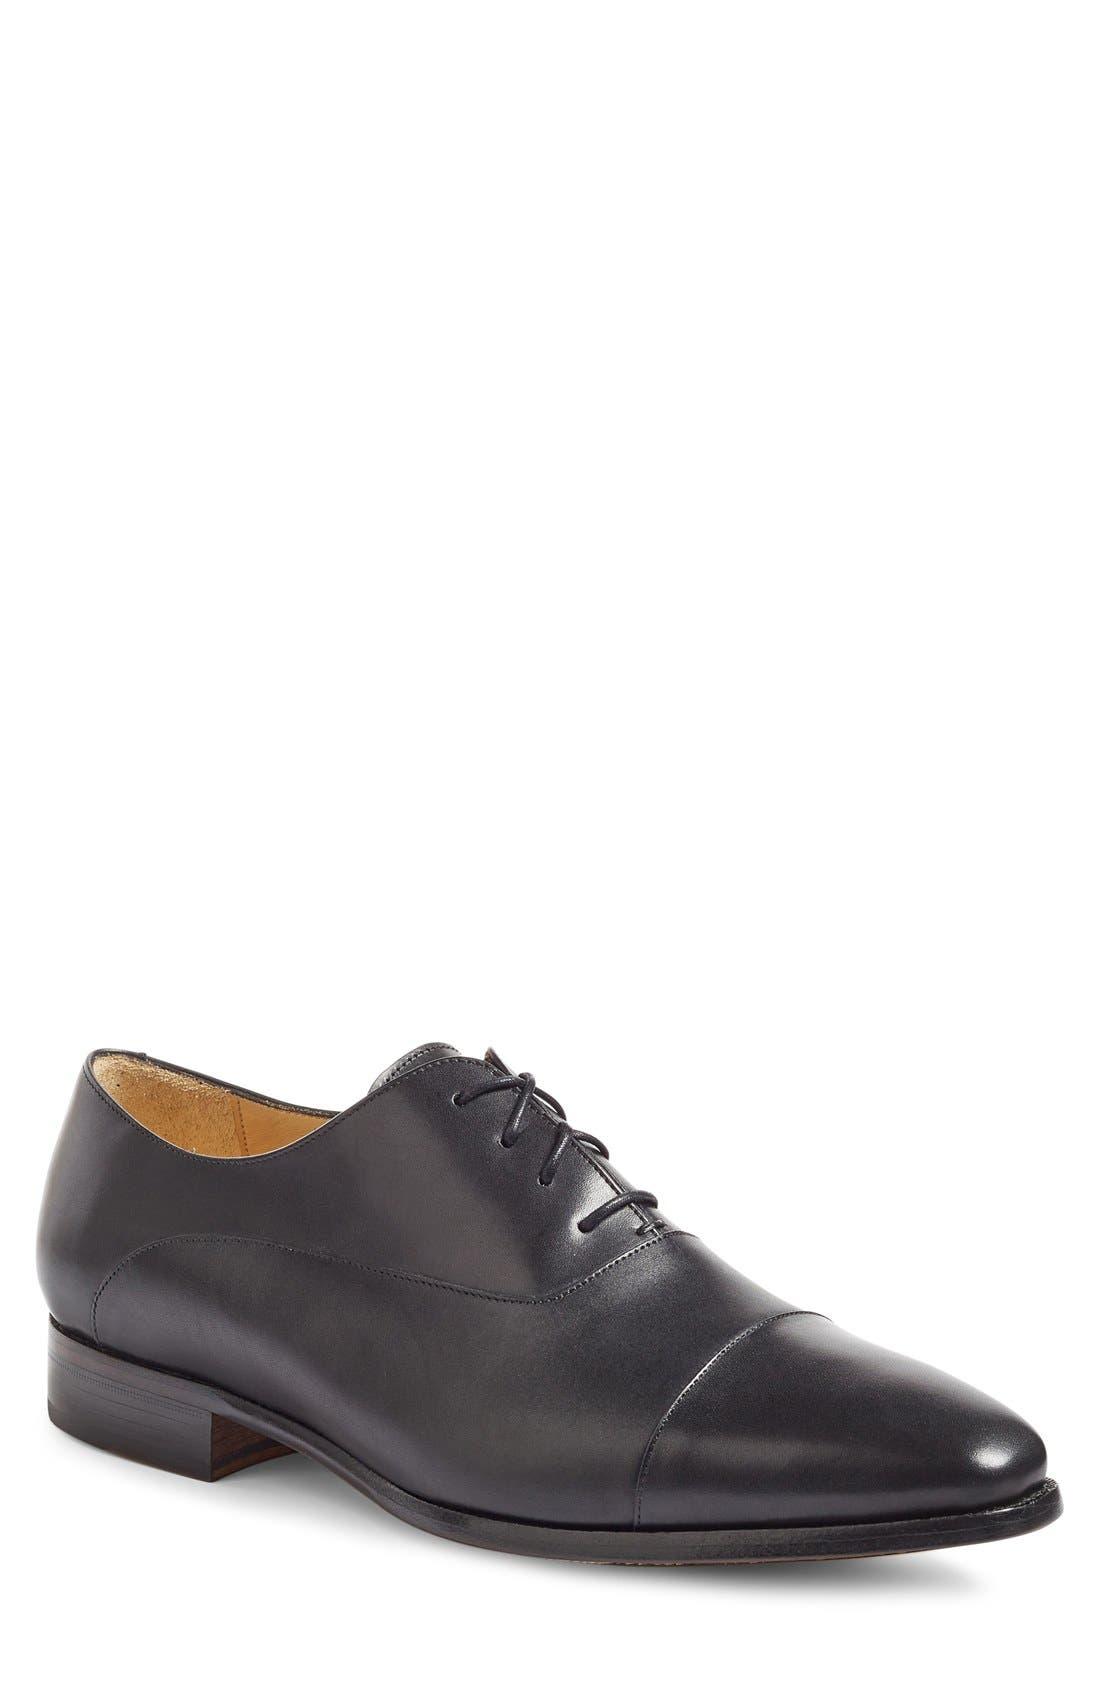 Joe Cap Toe Oxford,                             Main thumbnail 1, color,                             Black Leather